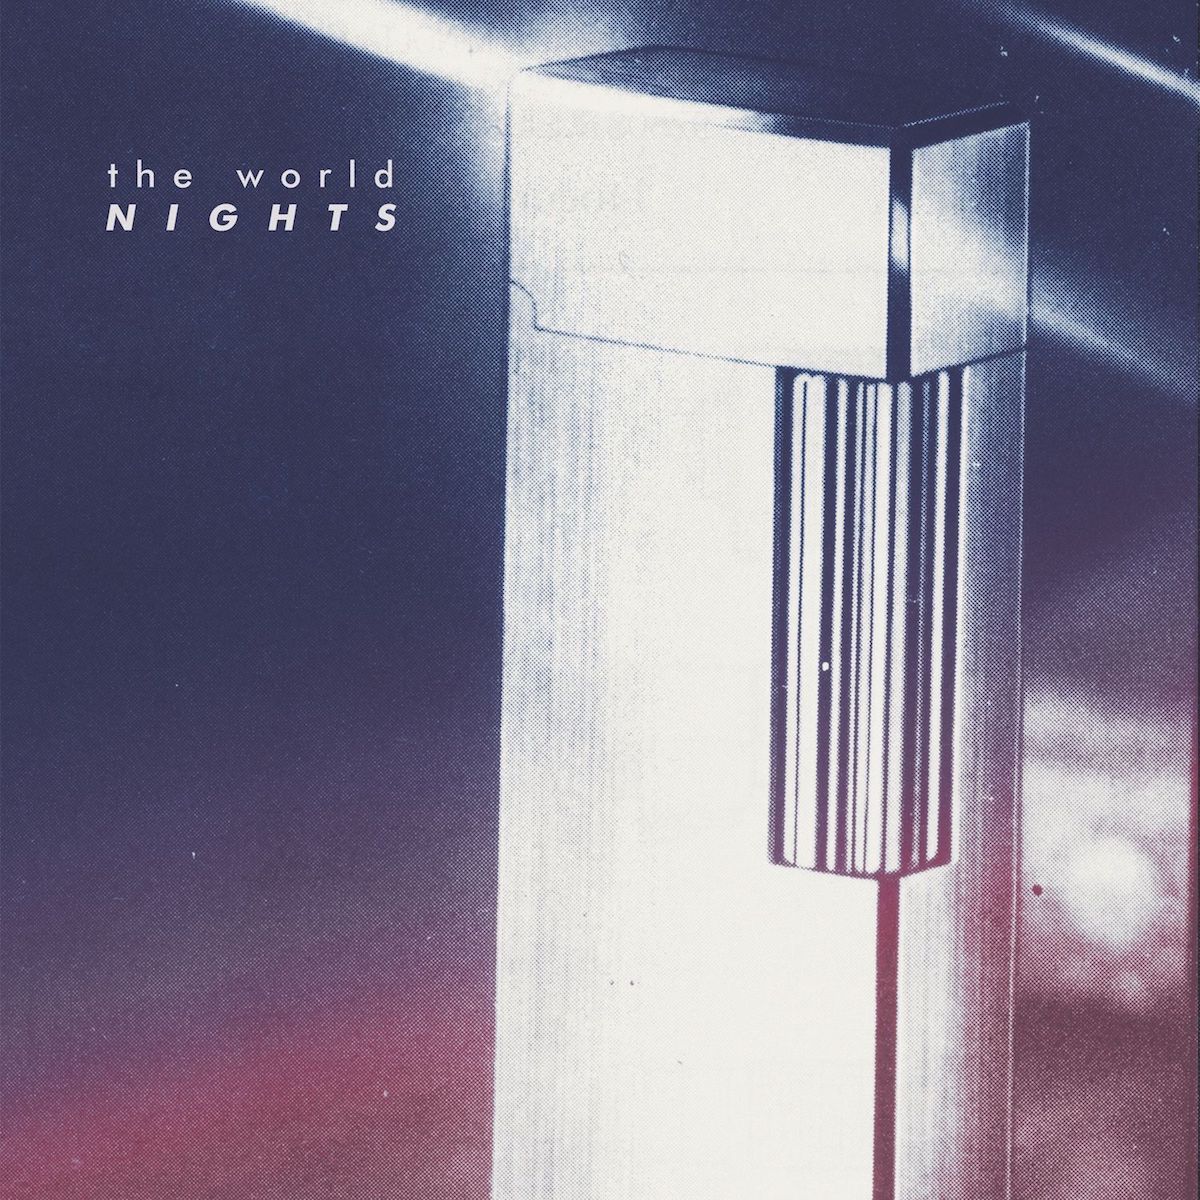 The World nights